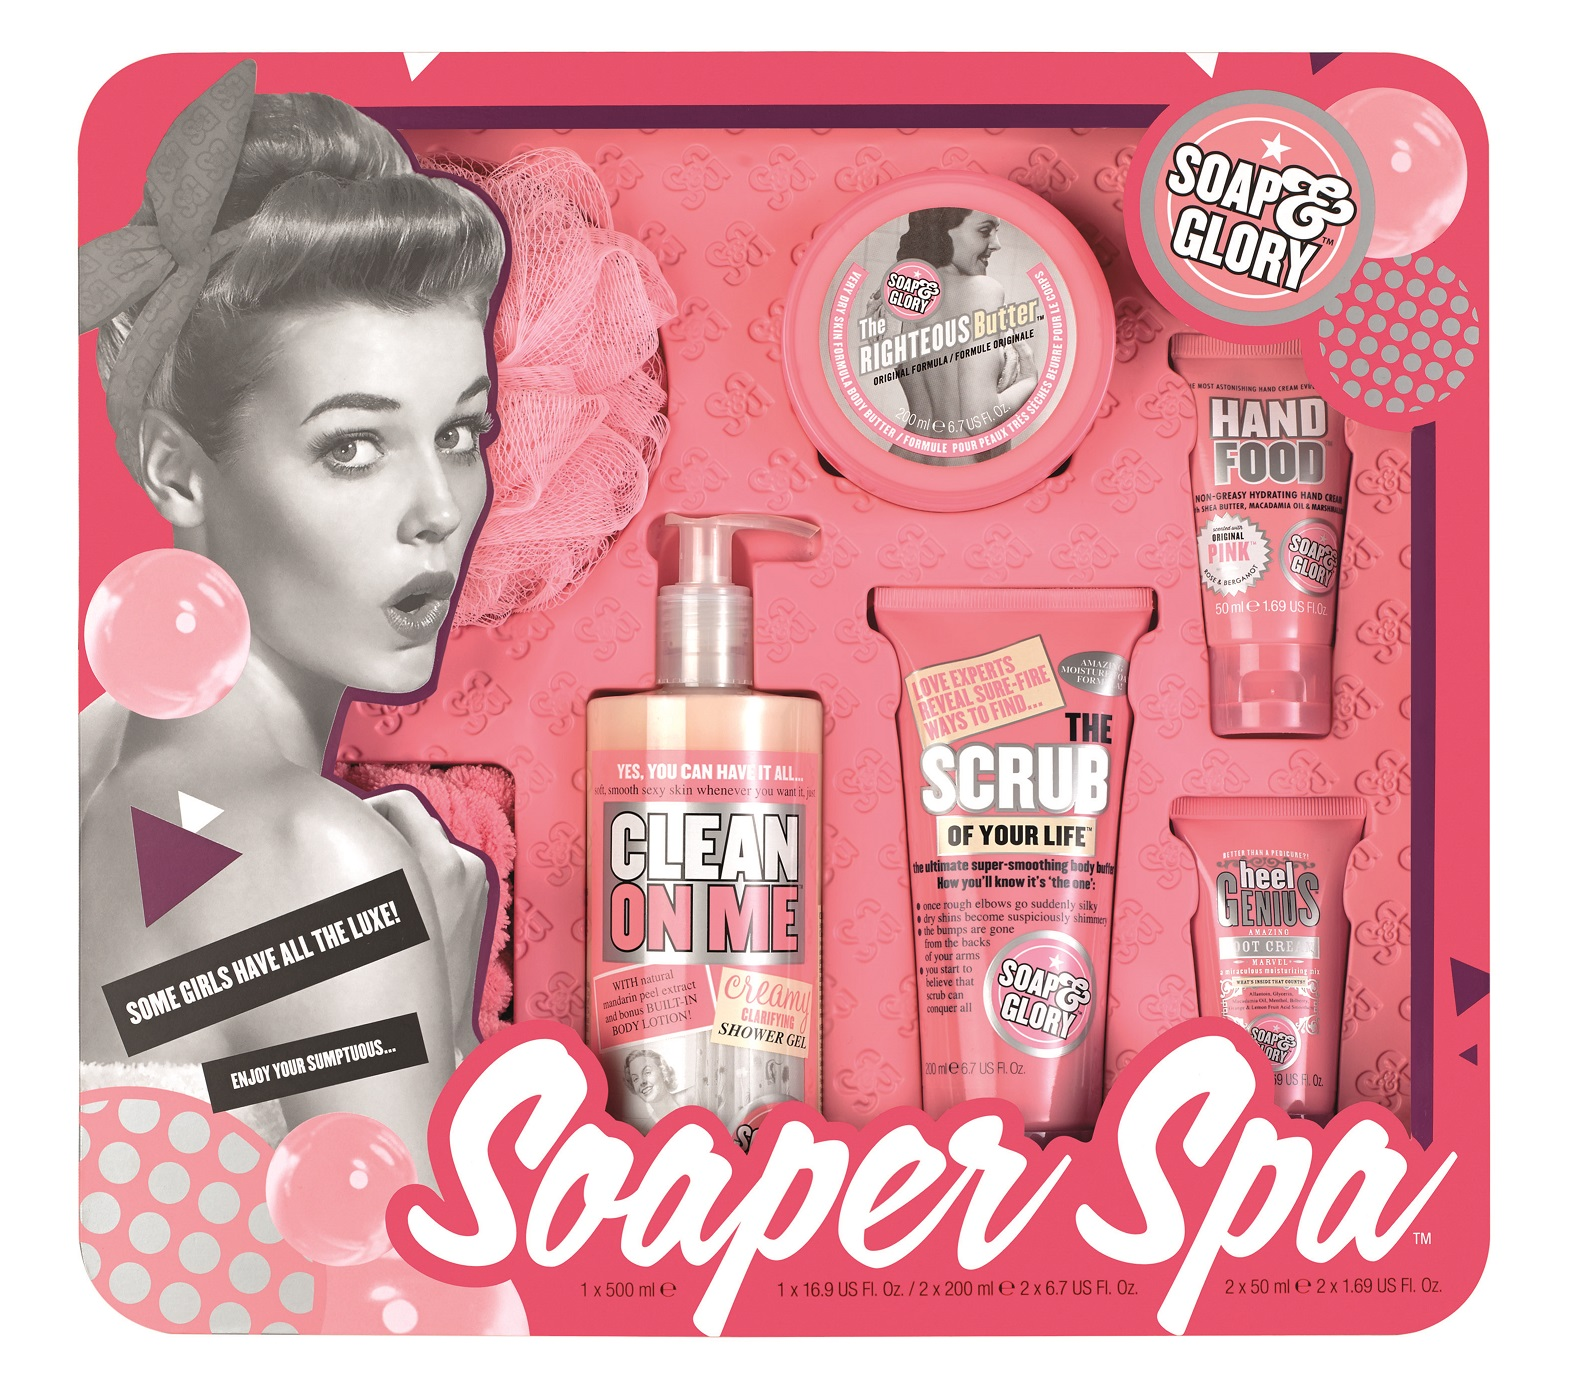 Soap & Glory Soaper Spa Set 50% Off at Walgreens | The Budget ...